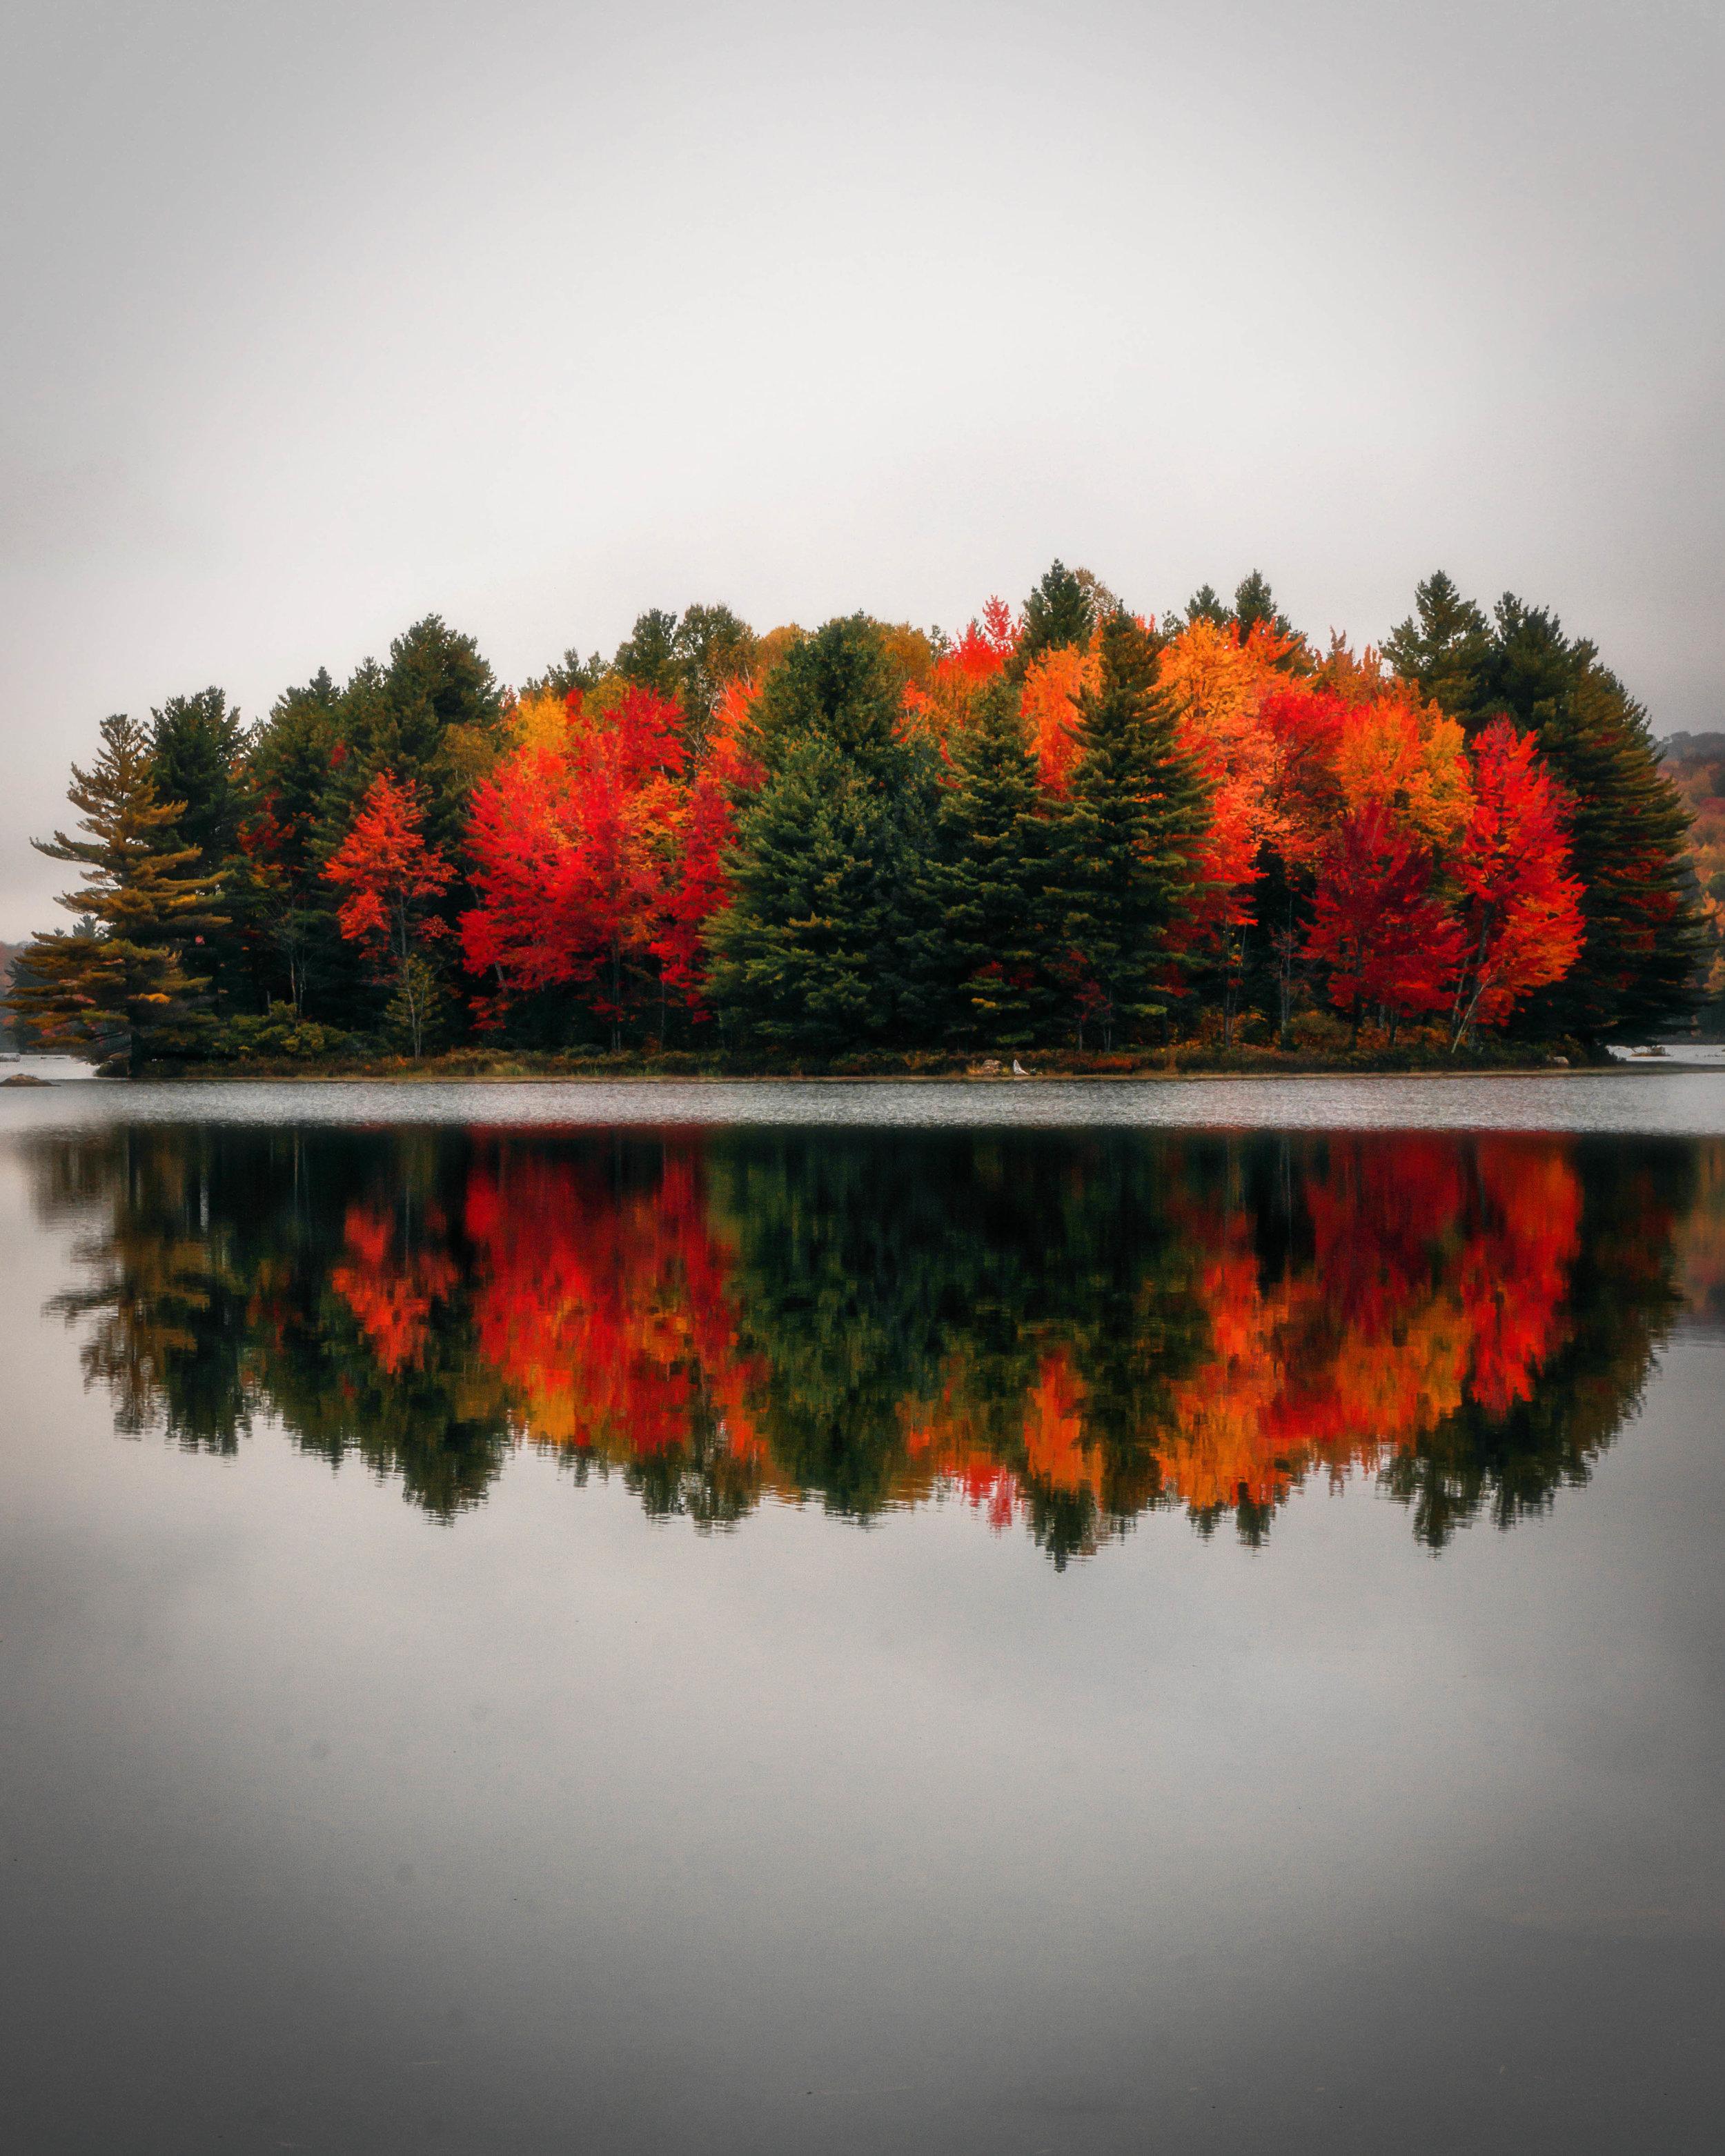 @photonicstories - Quebec, Canada